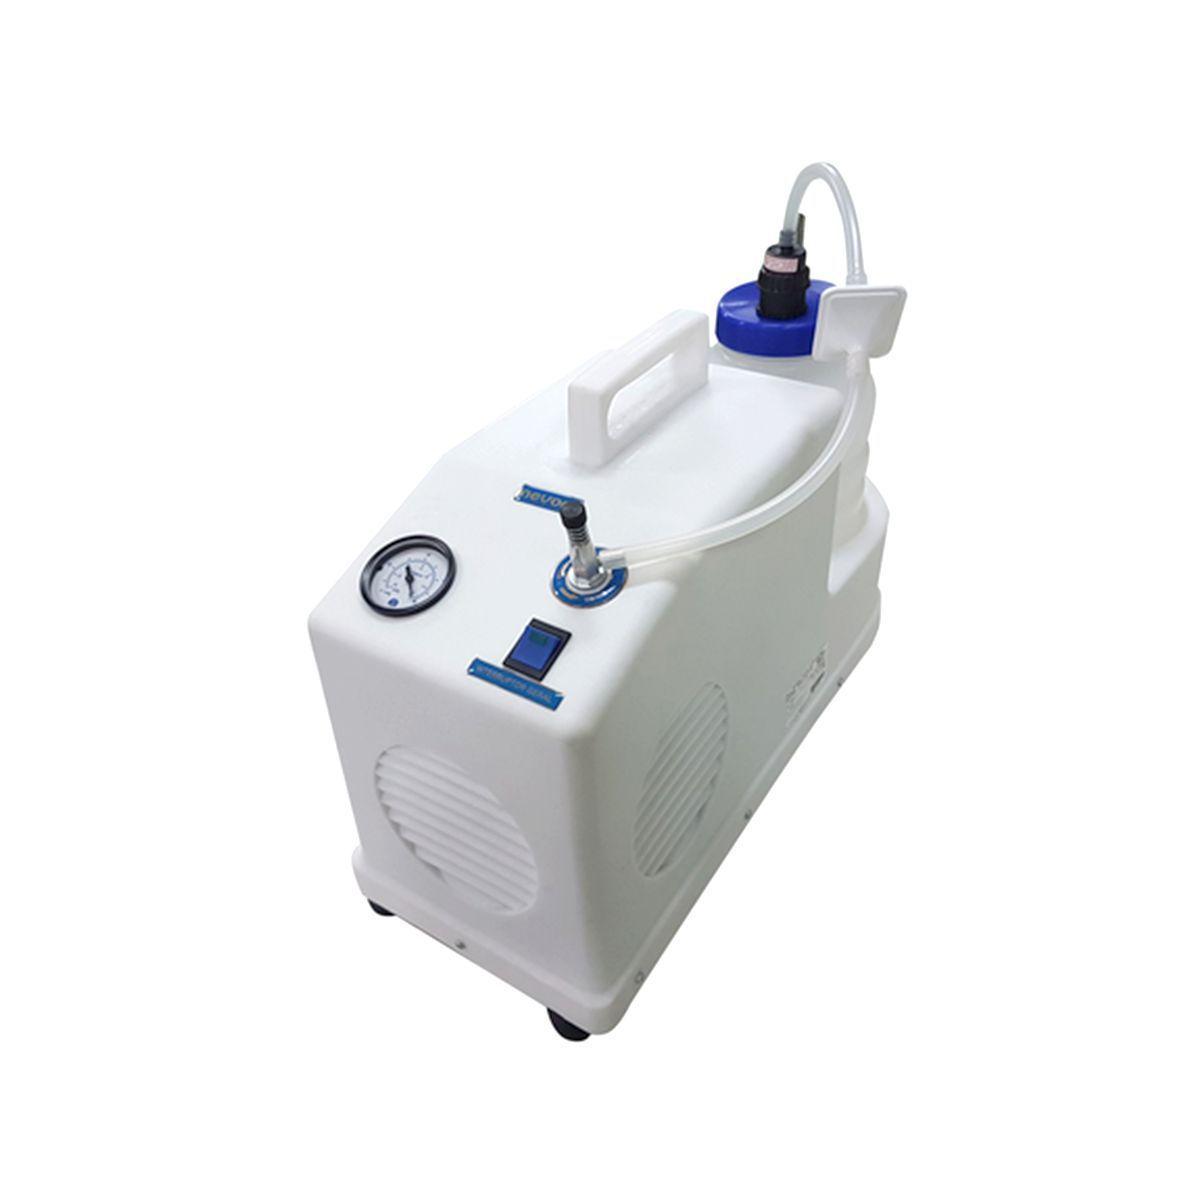 3003PO- Bomba Vácuo para Lipoaspiração -  Nevoni